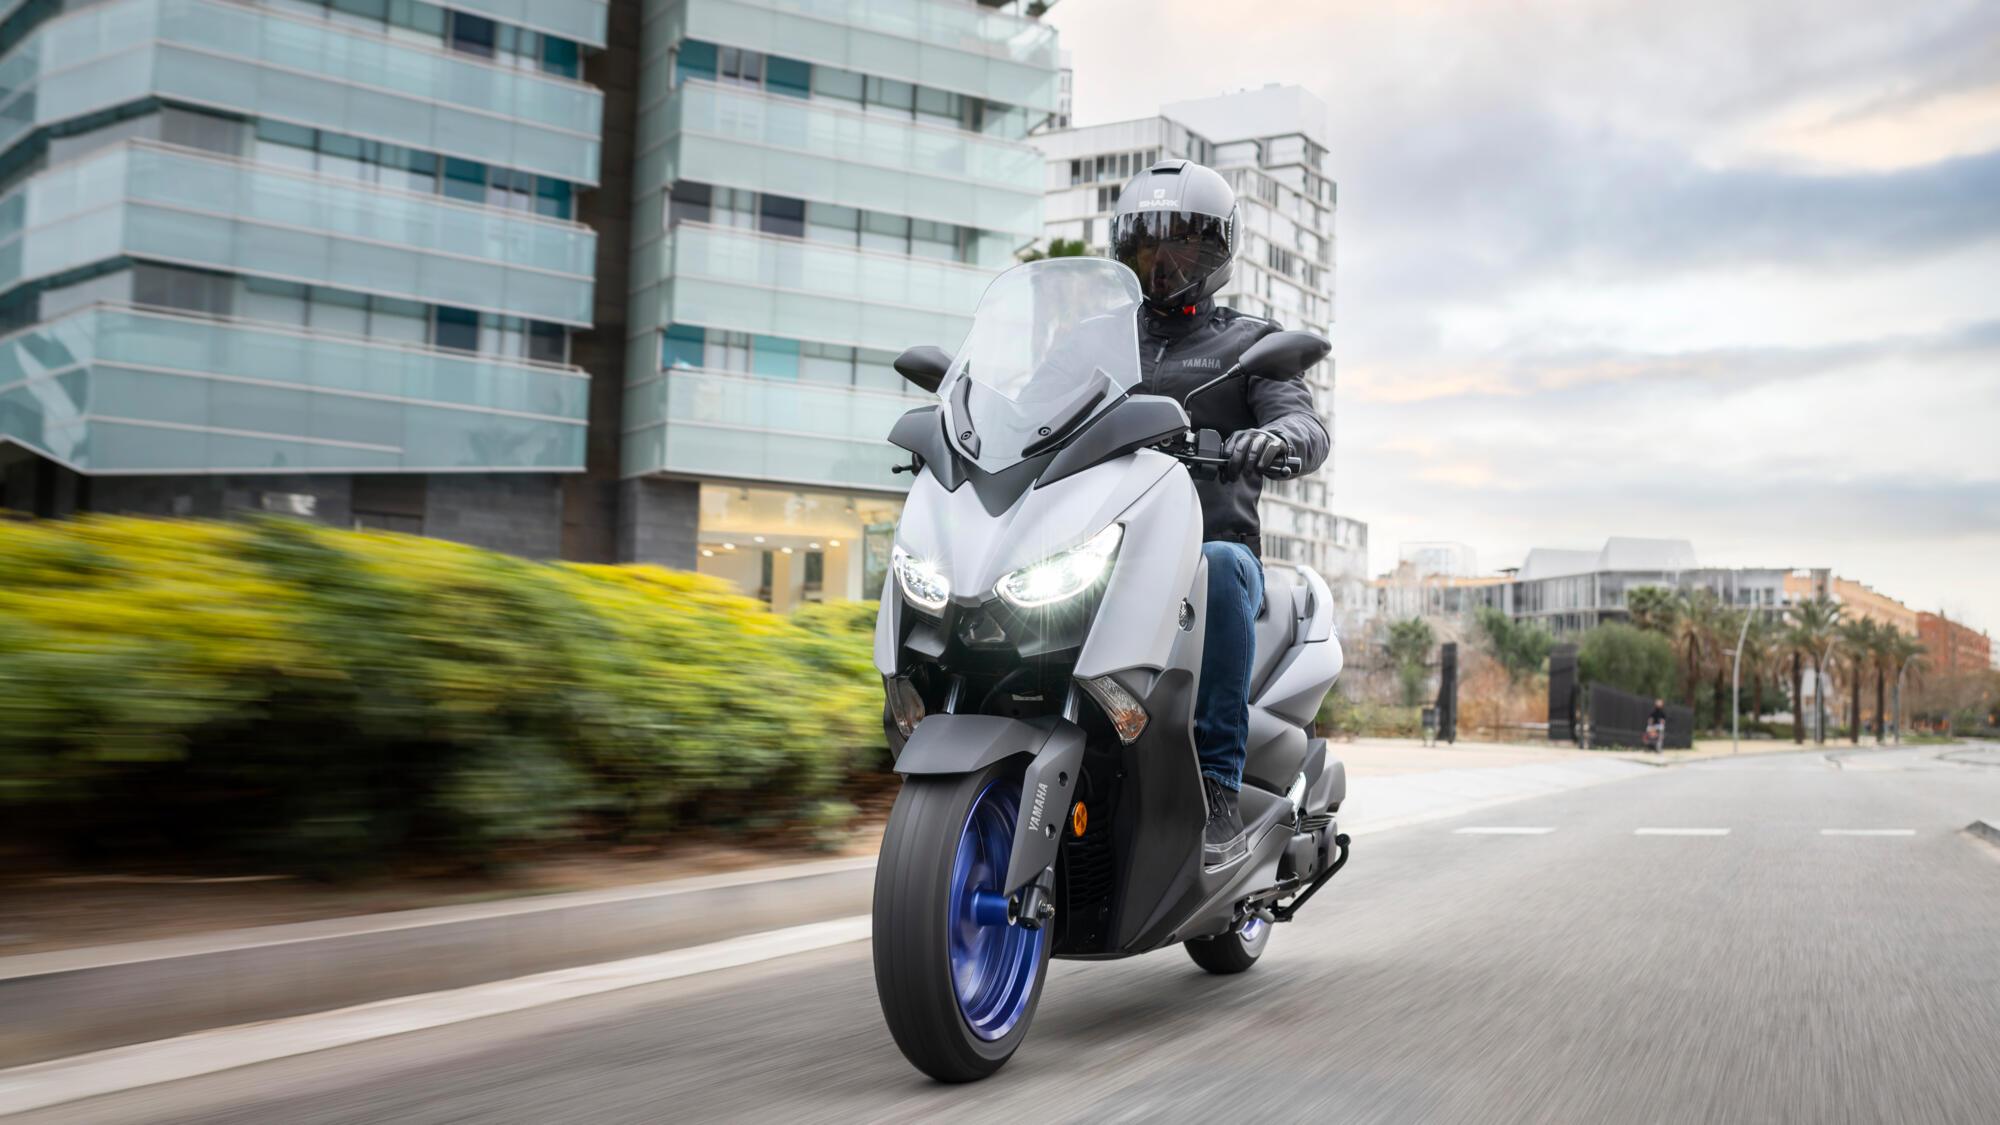 2021-Yamaha-XMAX125-EU-Icon_Grey-Action-001-03